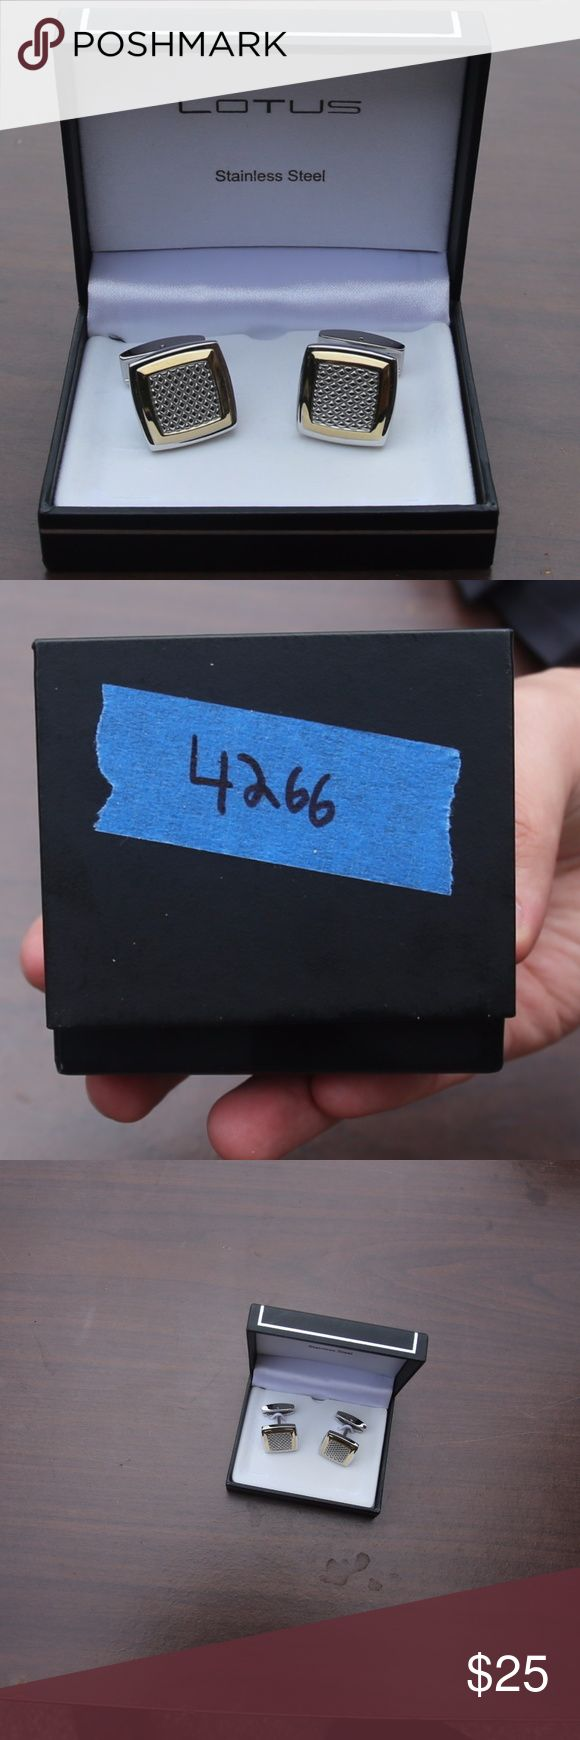 Lotus Silver Cufflinks Silver Lotus  Cufflinks. Gently used. Stainless Steel.  (Original price: $155) #4266 Lotus Accessories Cuff Links